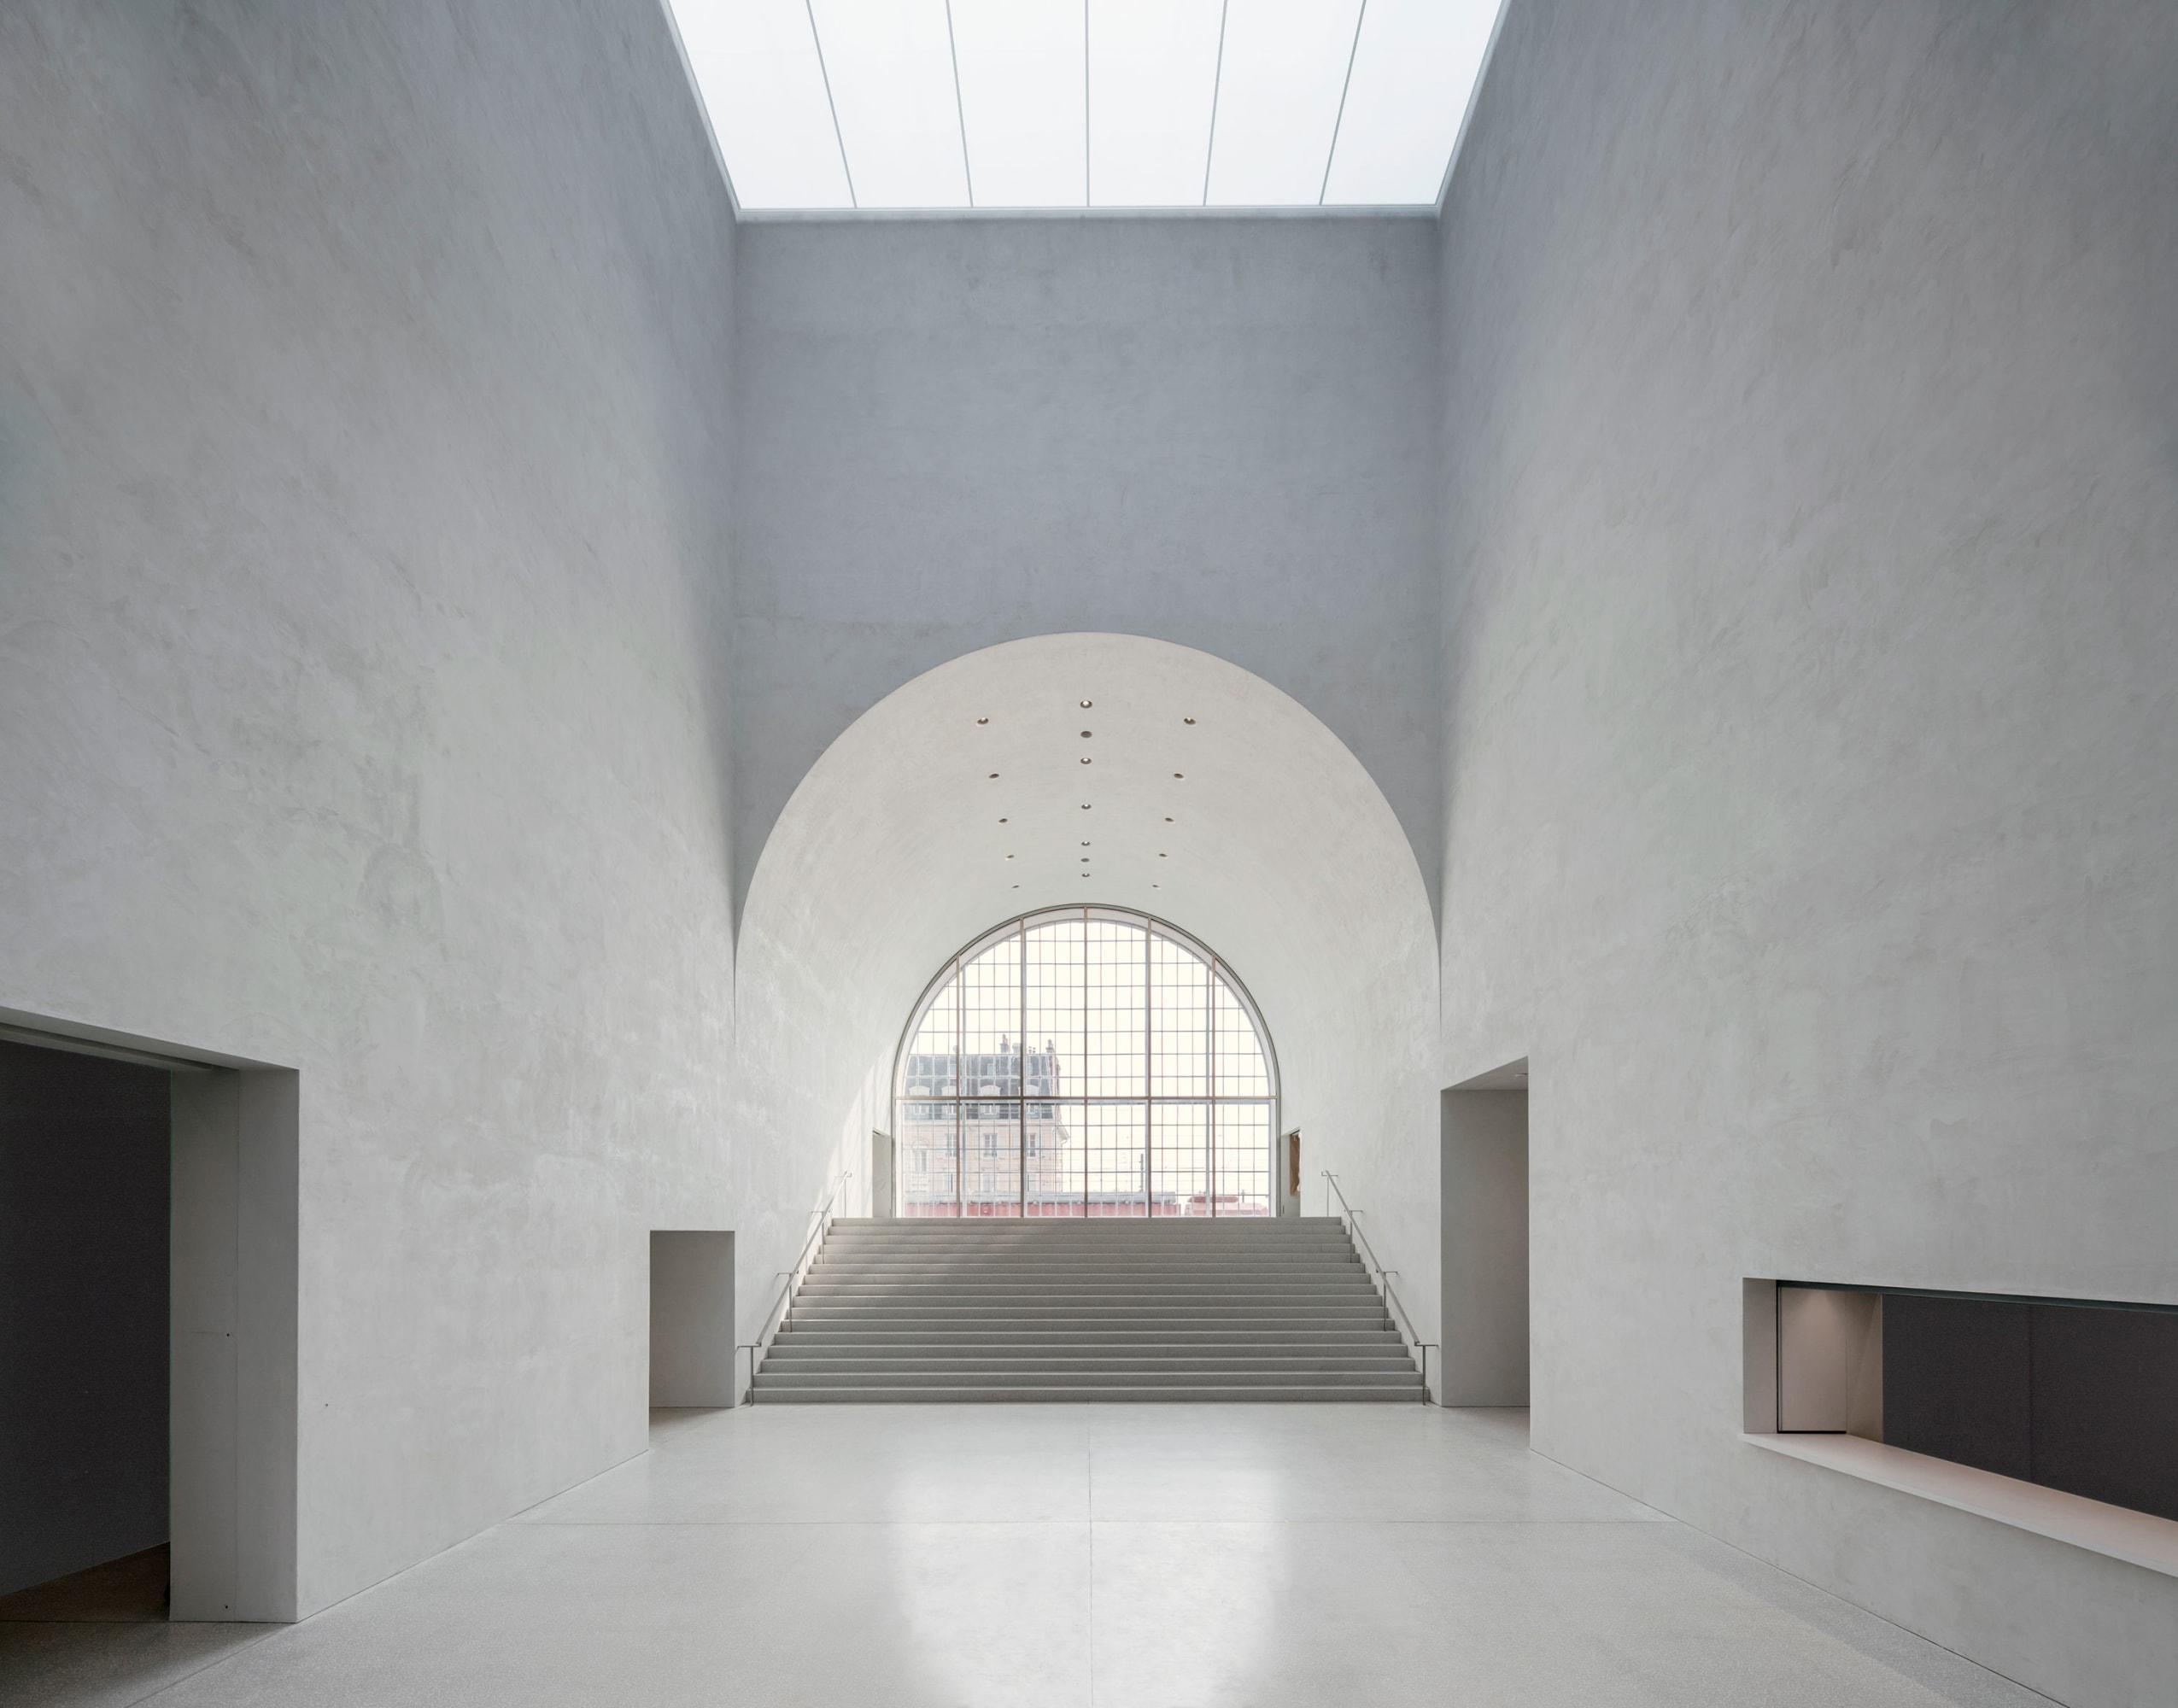 Barozzi / Veiga, Simon Menges · MCBA - Musée Cantonal des